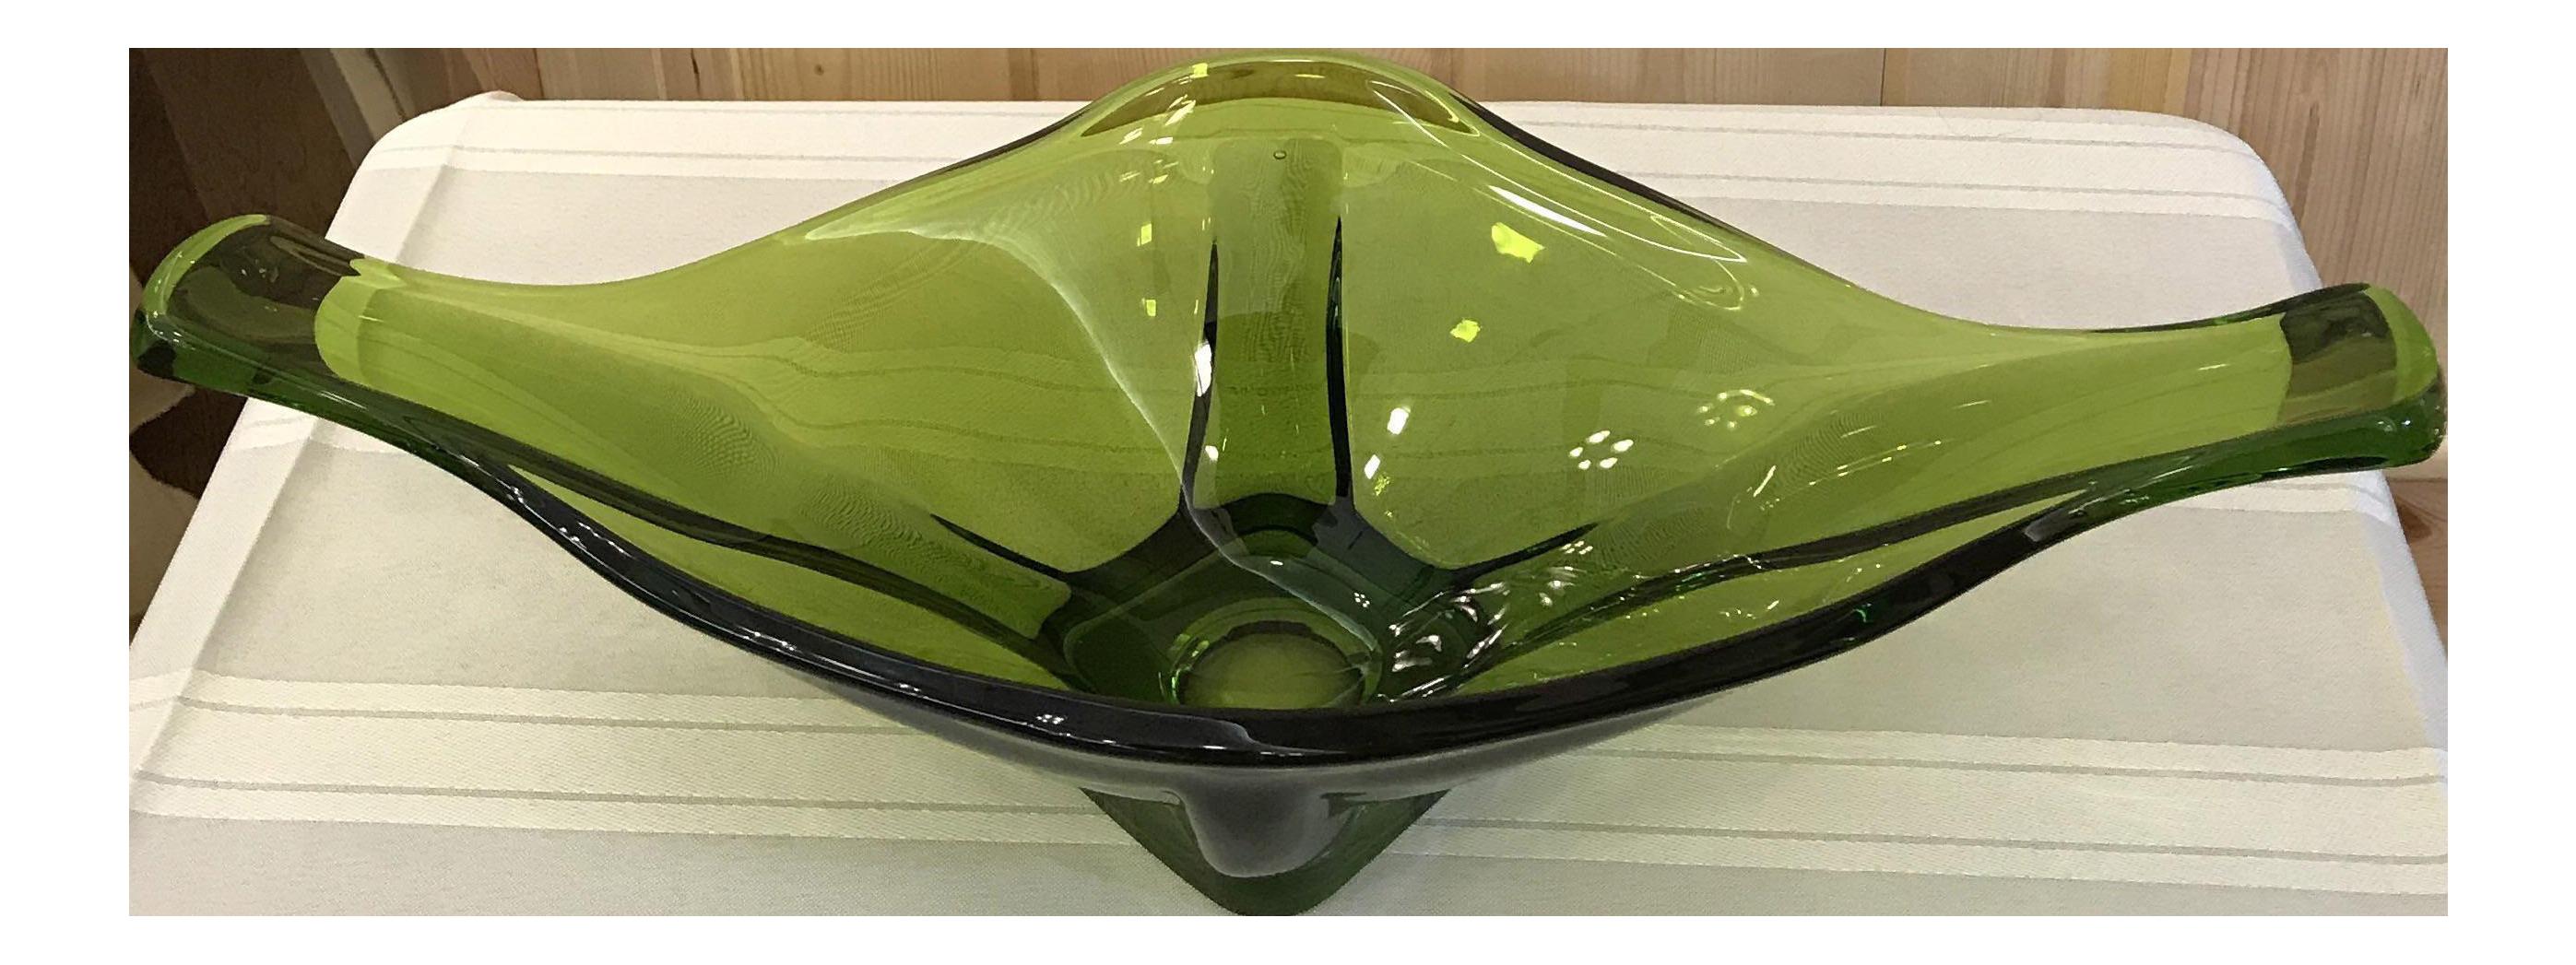 Mid century modern green art glass centerpiece bowl chairish